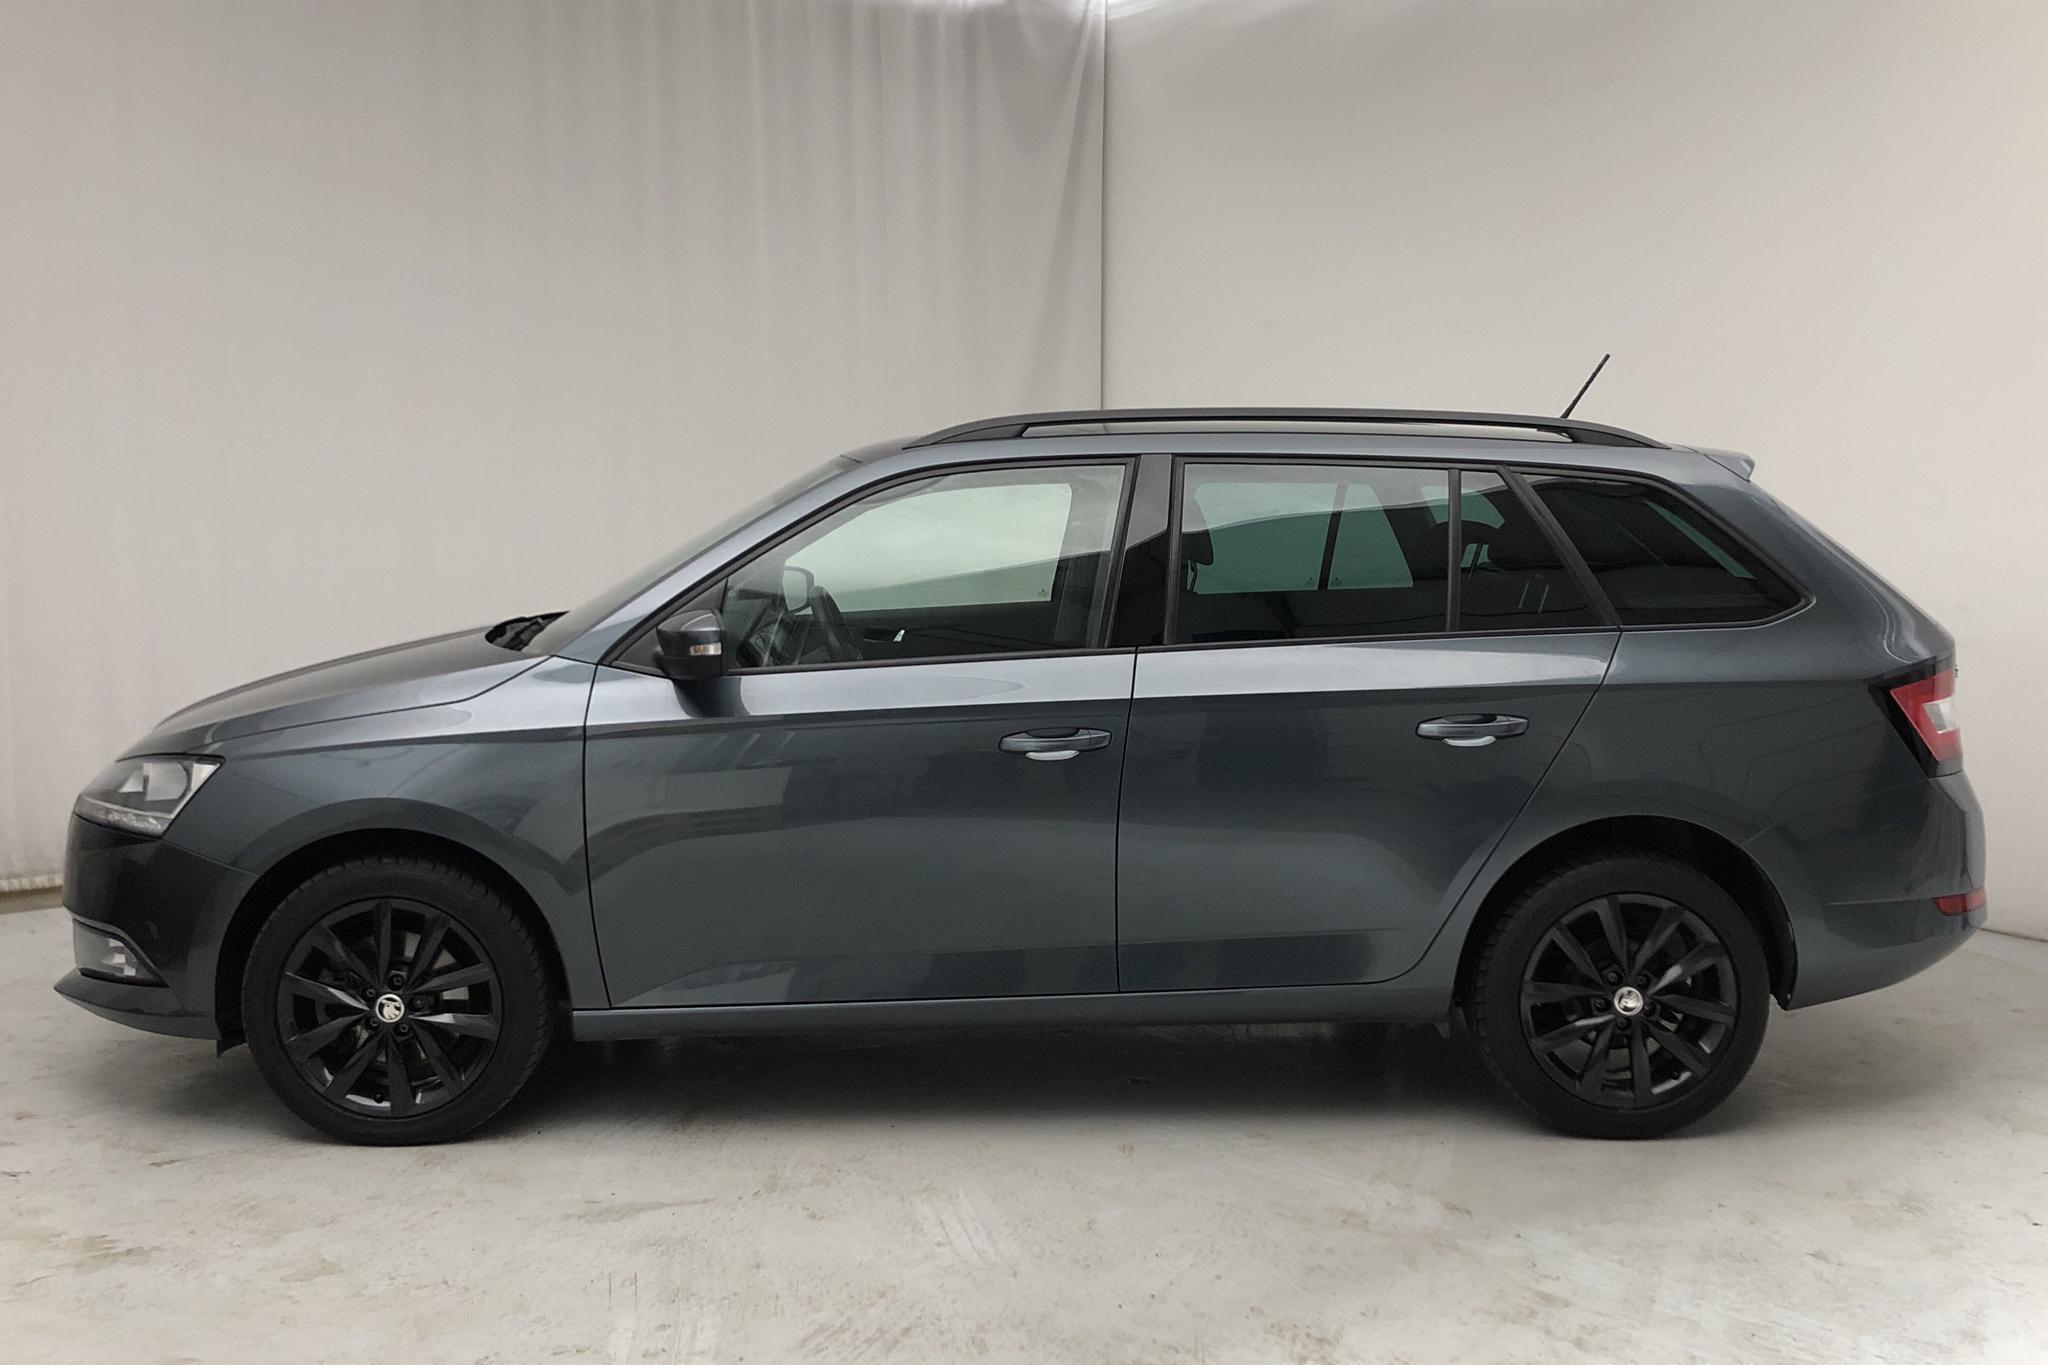 Skoda Fabia 1.0 TSI Kombi (110hk) - 47 660 km - Automatic - Dark Grey - 2019